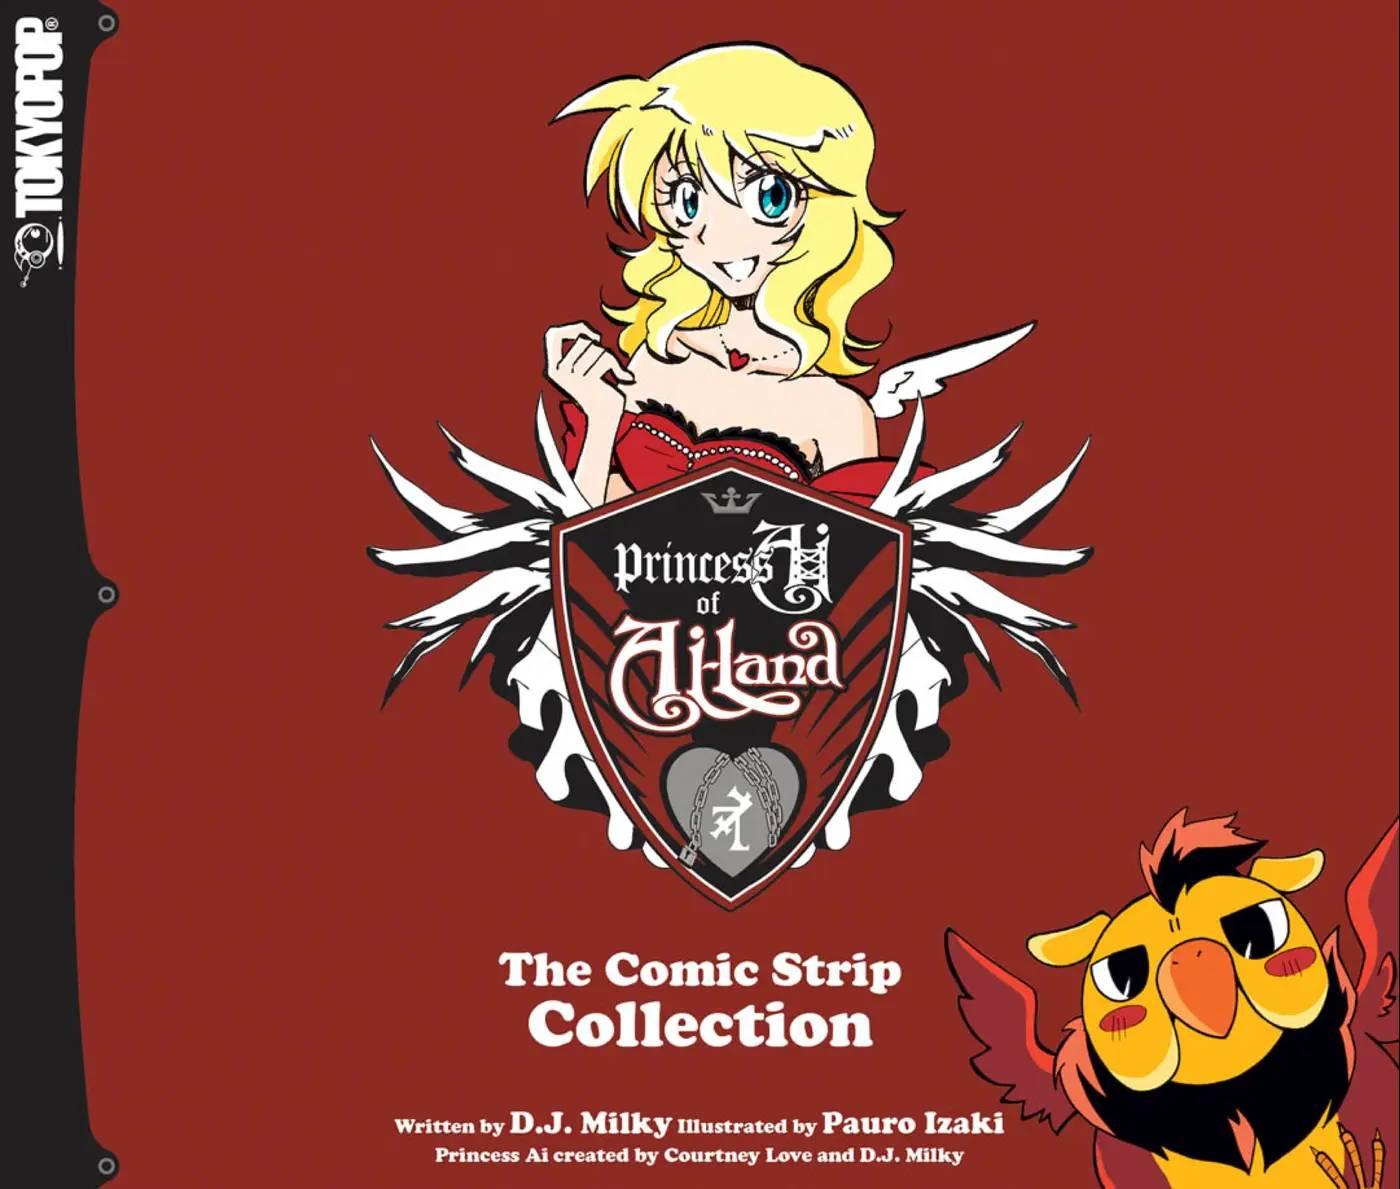 Princess Ai of Ai-Land: The Comic Strip Collection